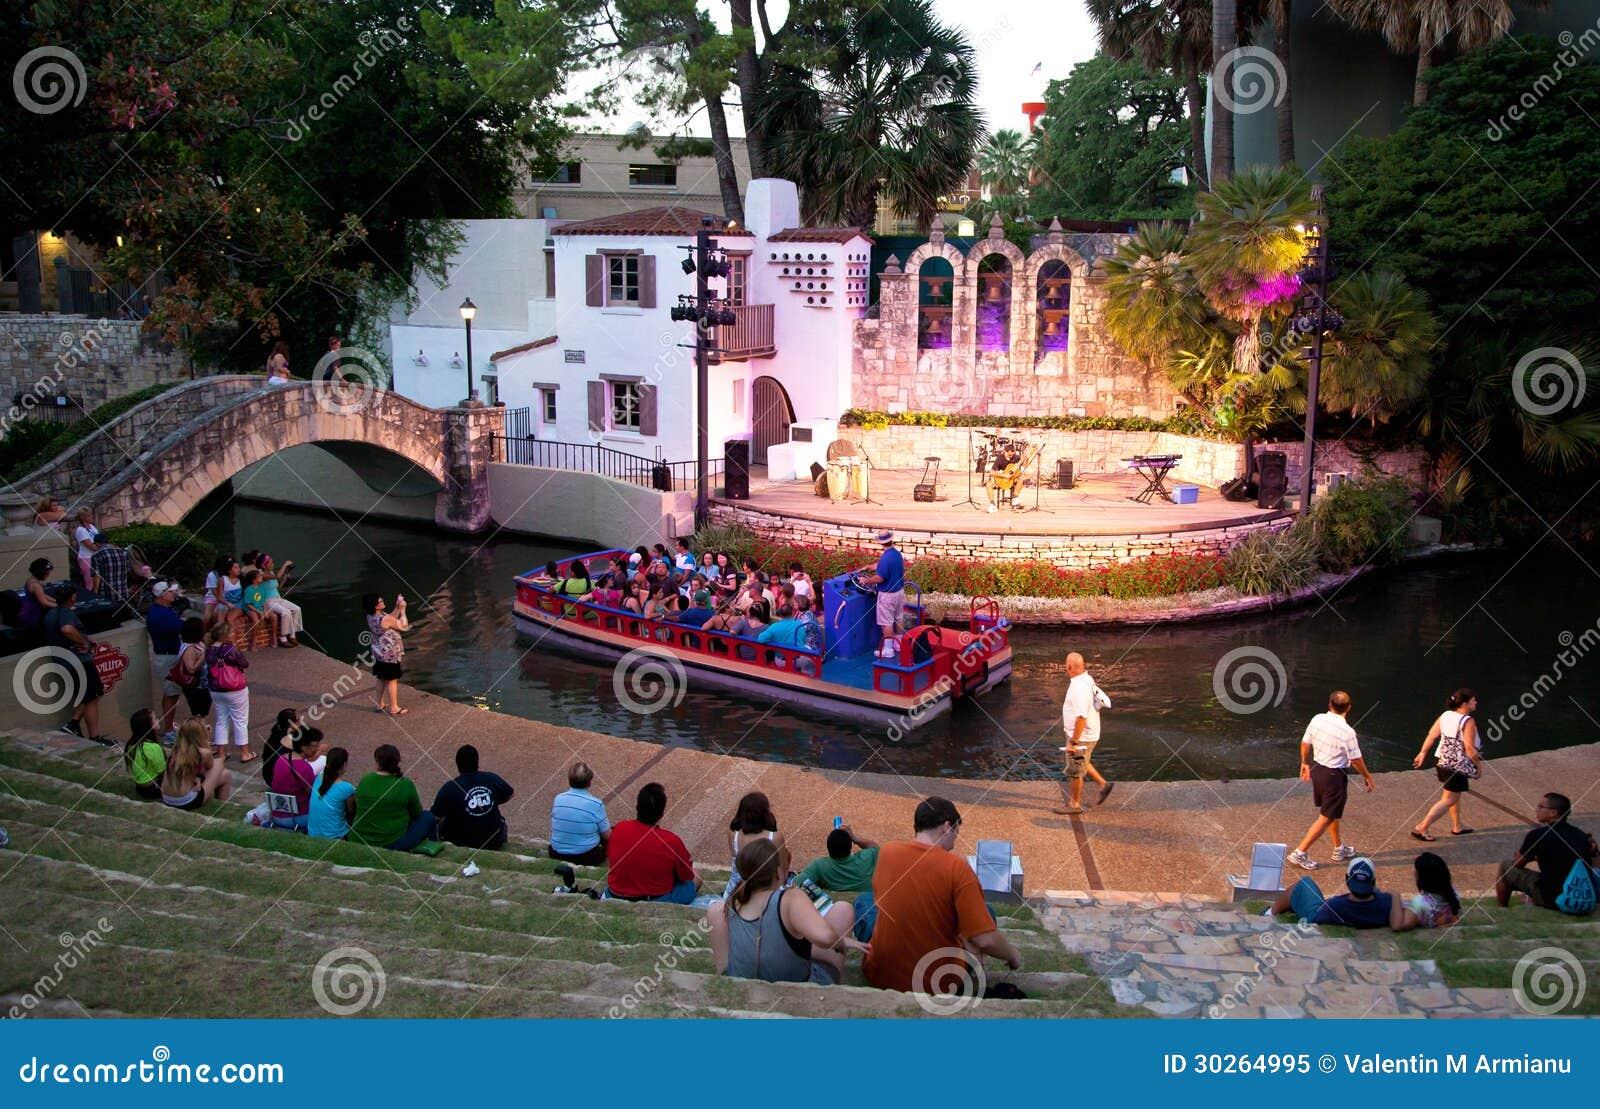 San Antonio Riverwalk Theater Editorial Image Image